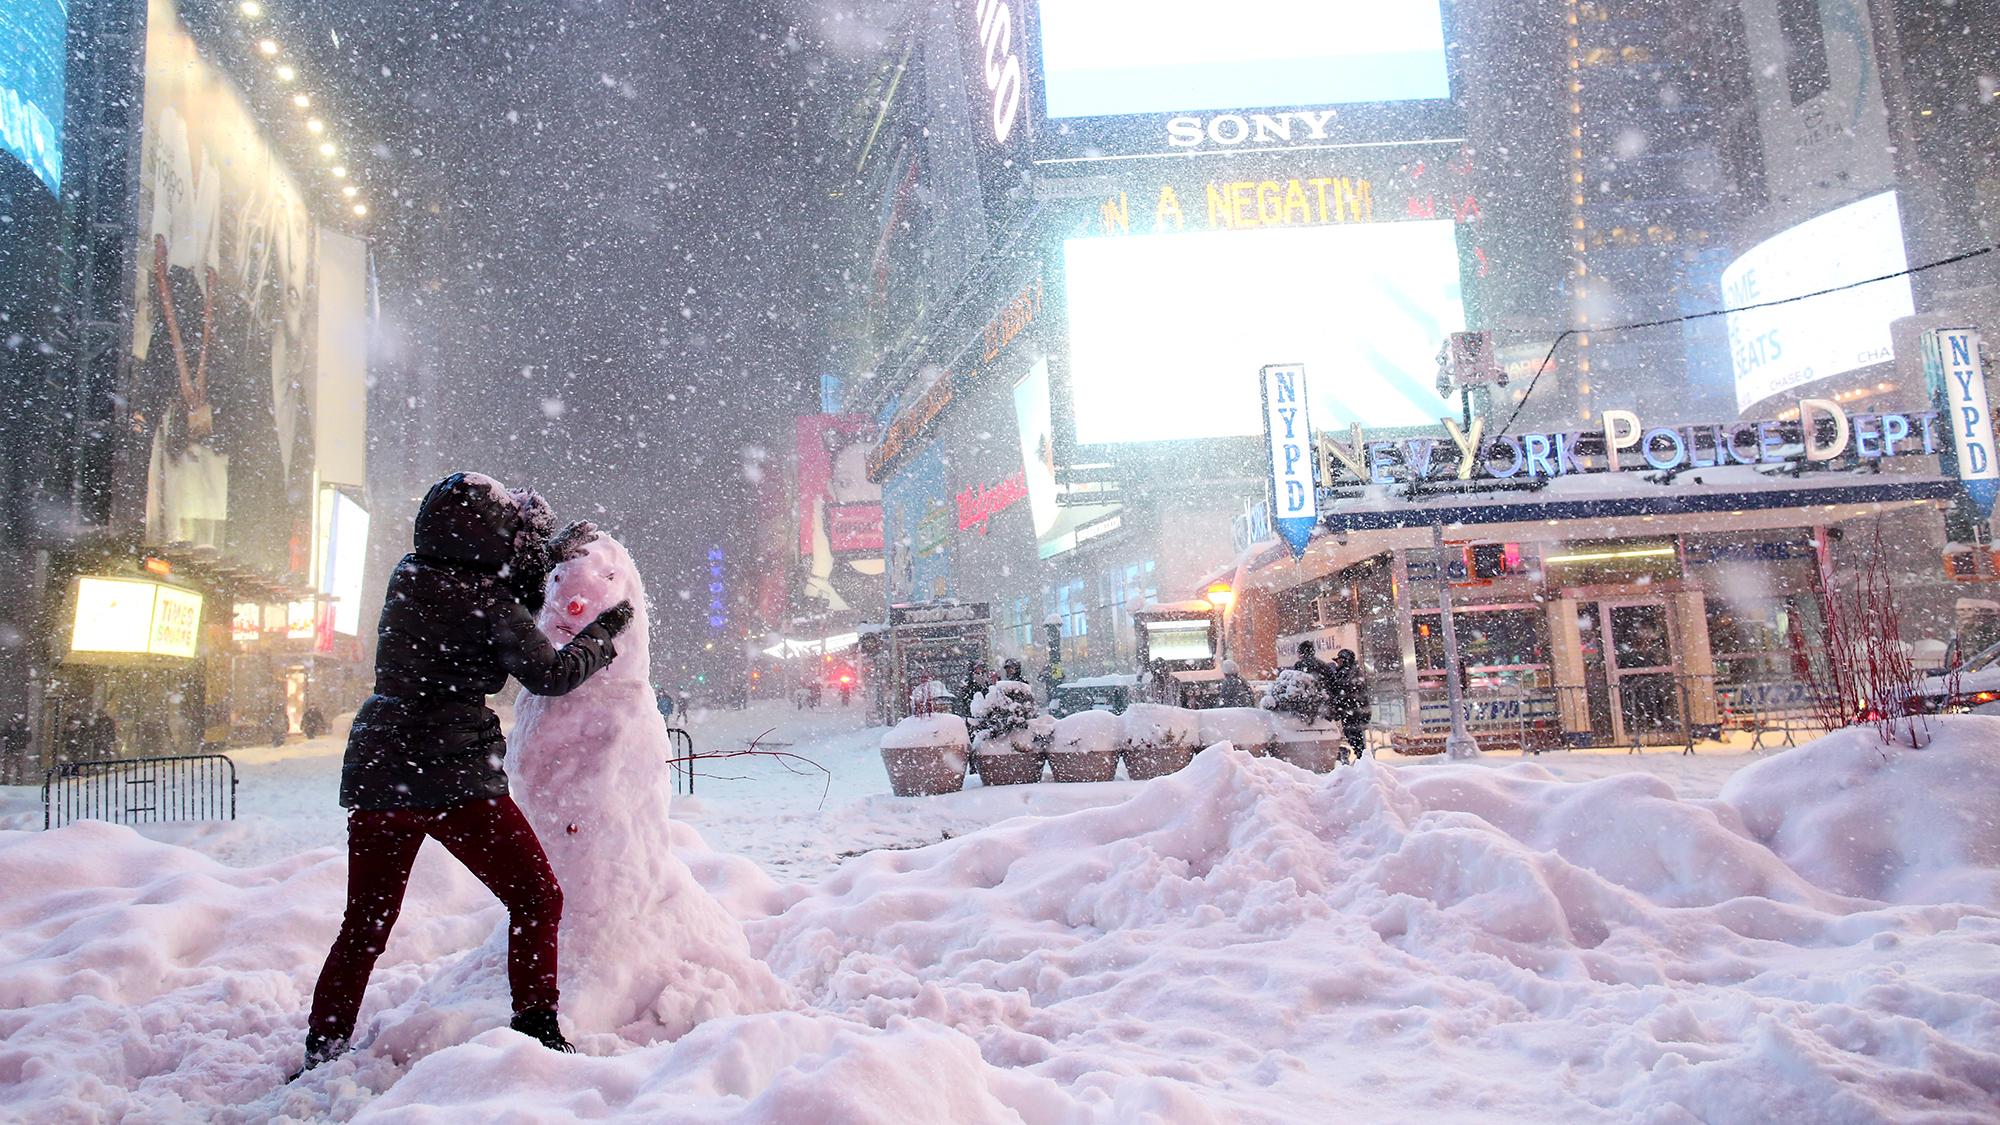 A Big El Niño Was The Likely Instigator Of Last Week's Blizzard